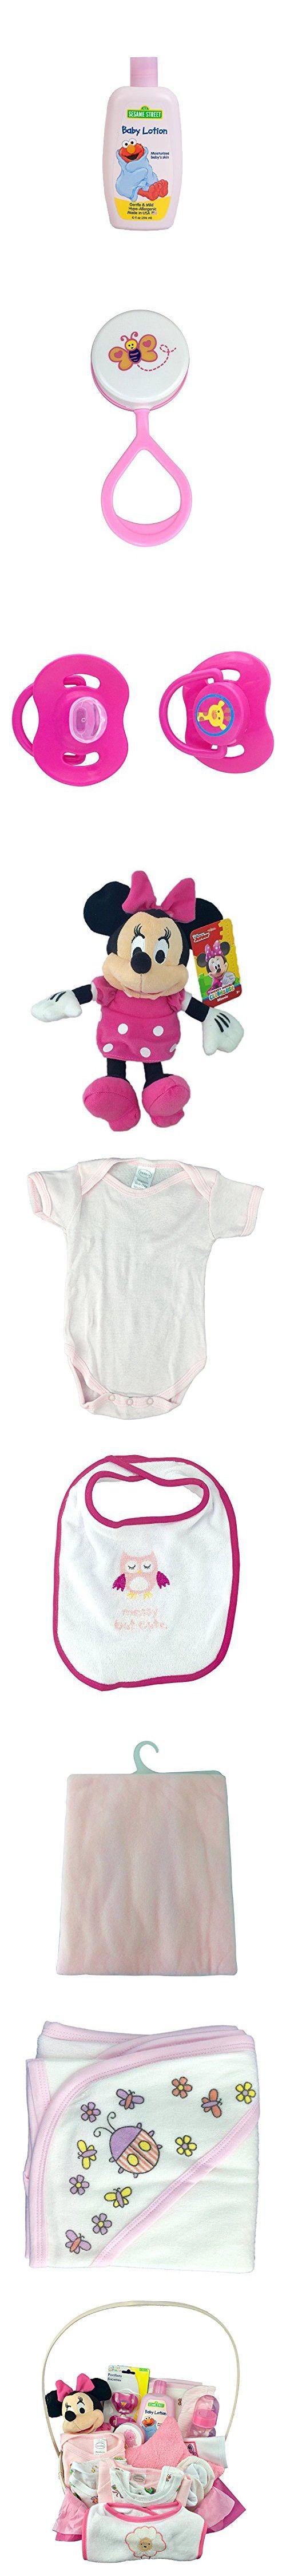 NEWBORN BABY GIRL GIFT BASKET- MEDIUM PINK